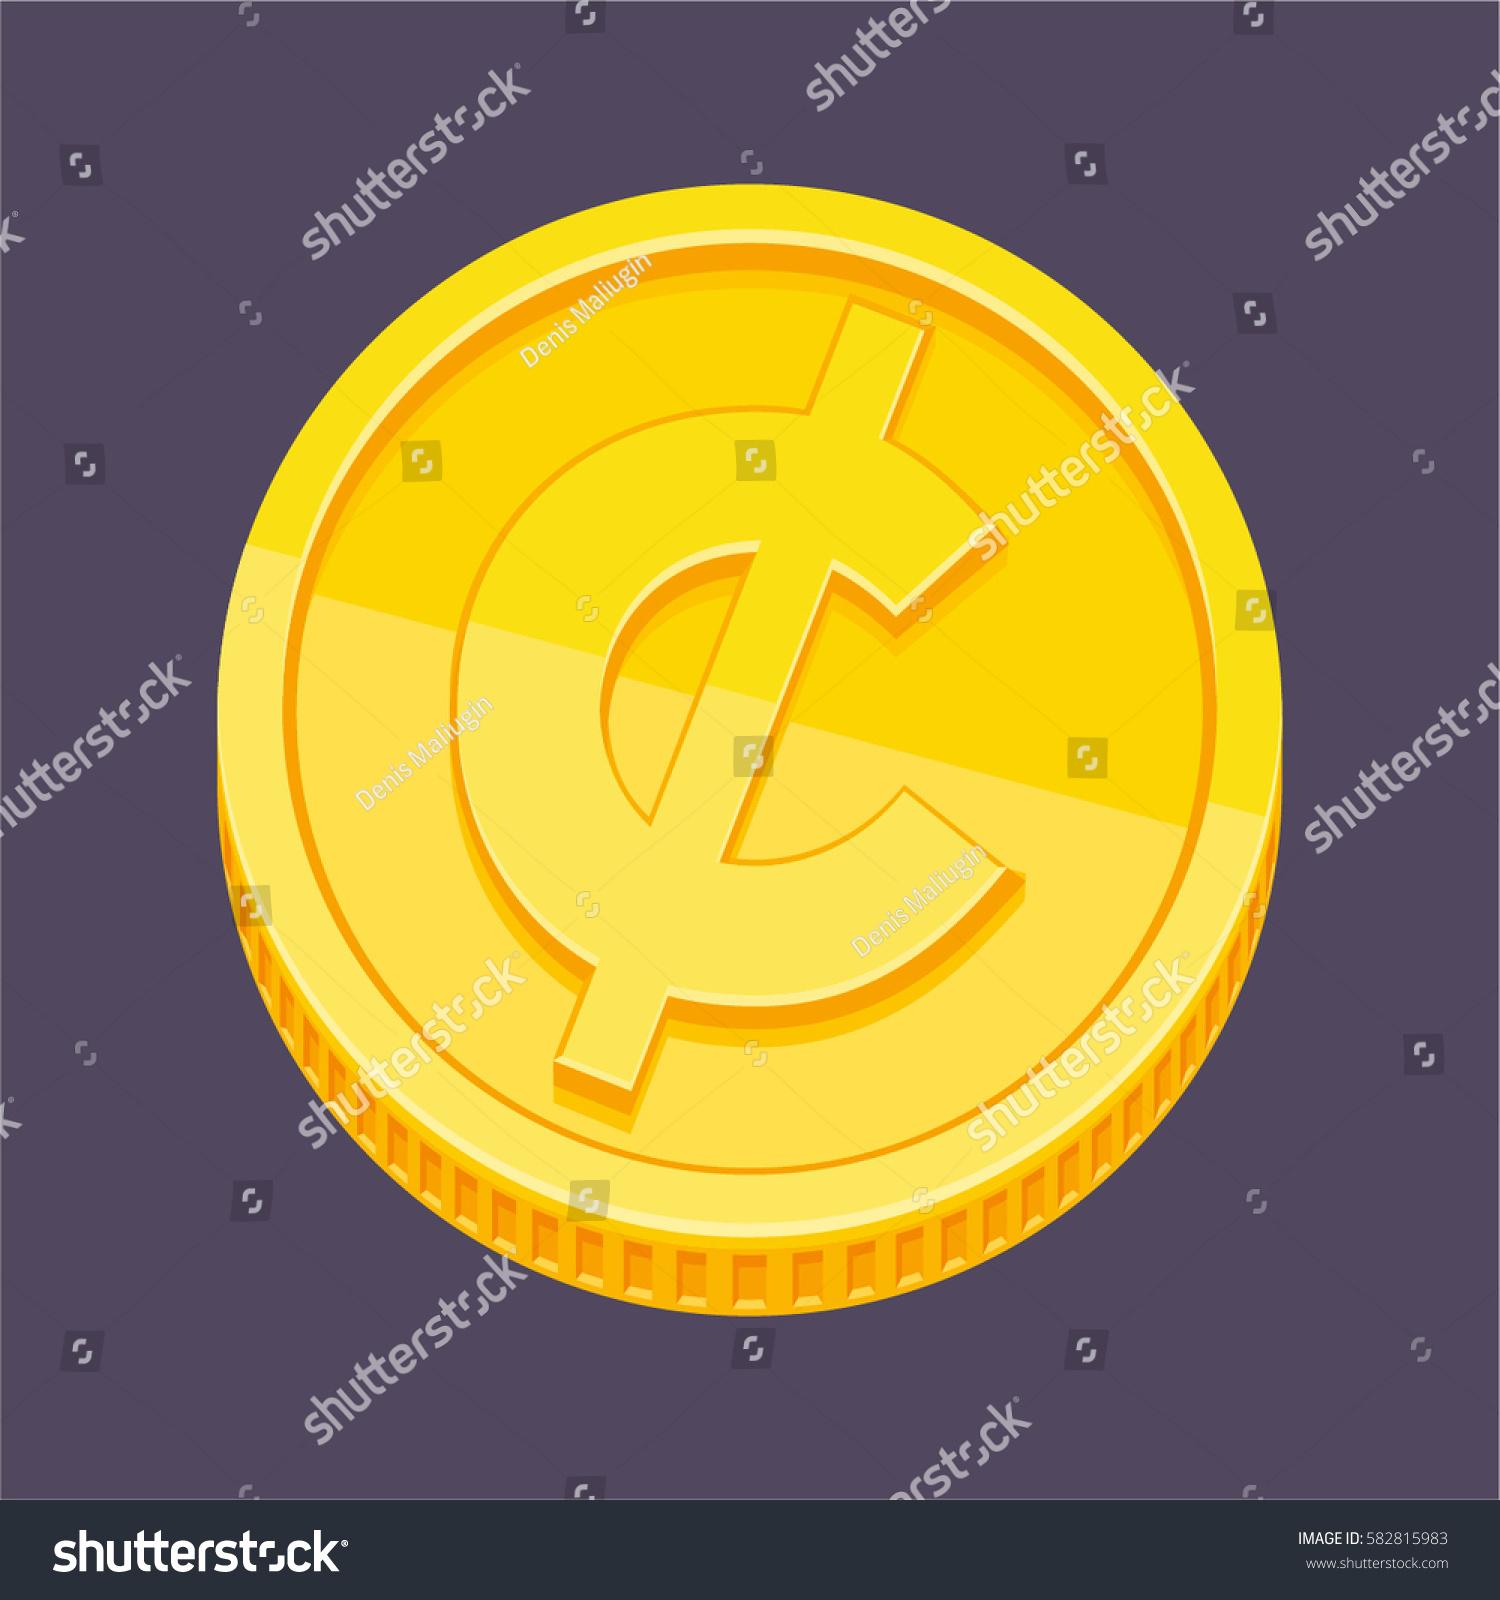 Roman Symbols On Us Currency